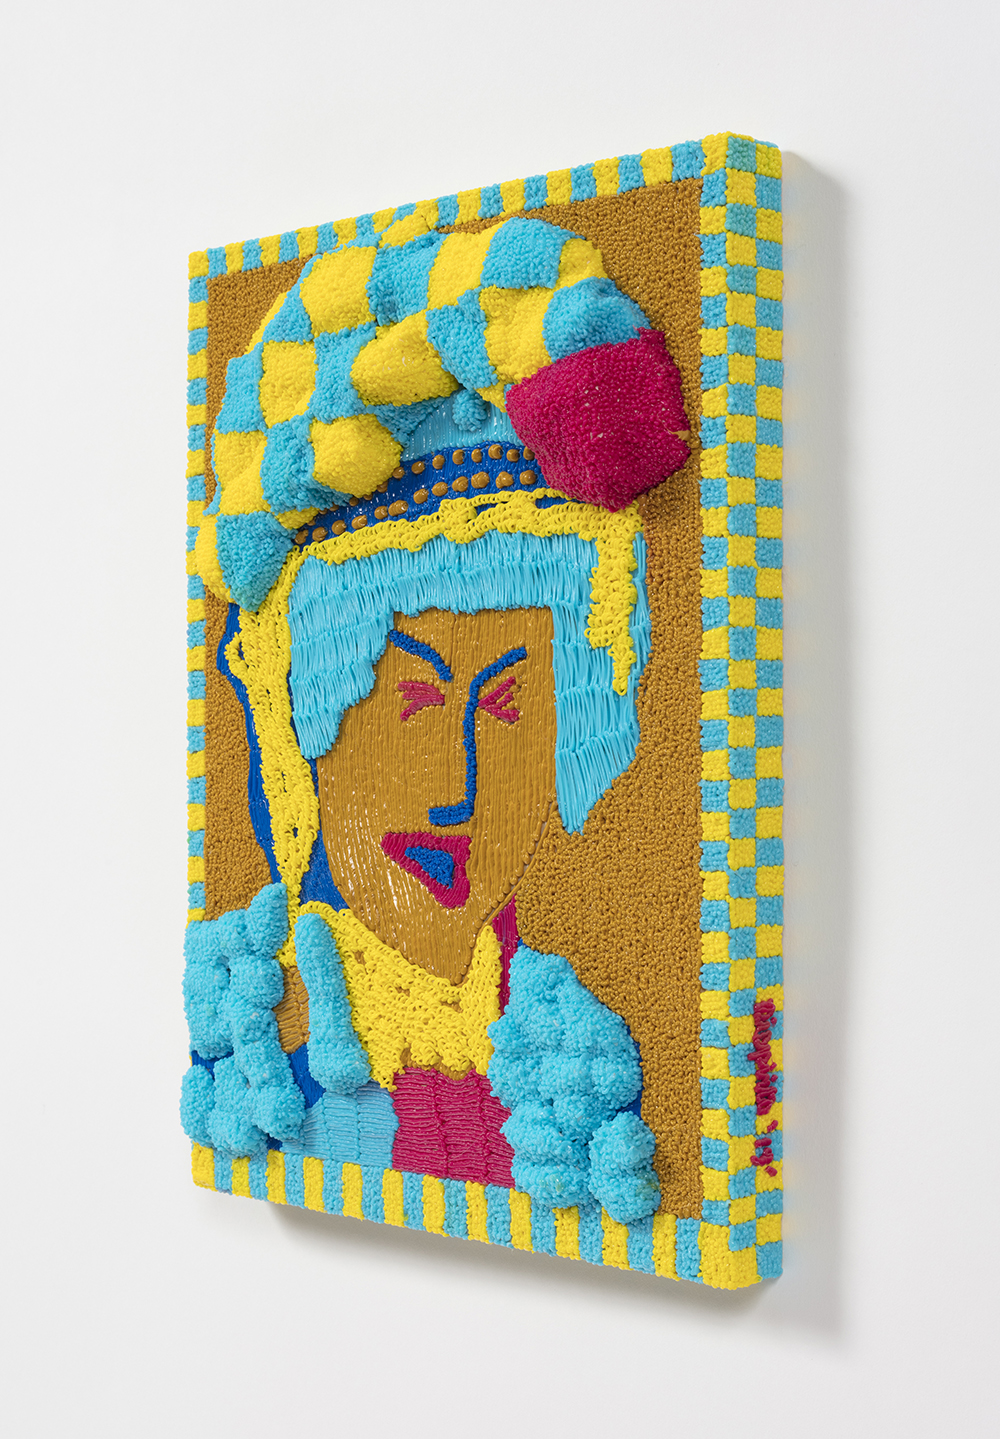 Dominic Dispirito. <em>Avin a slash</em>, 2018. Manually printed PLA plastic on board, 11 3/4 x 8 1/4 inches  (30 x 21 cm)